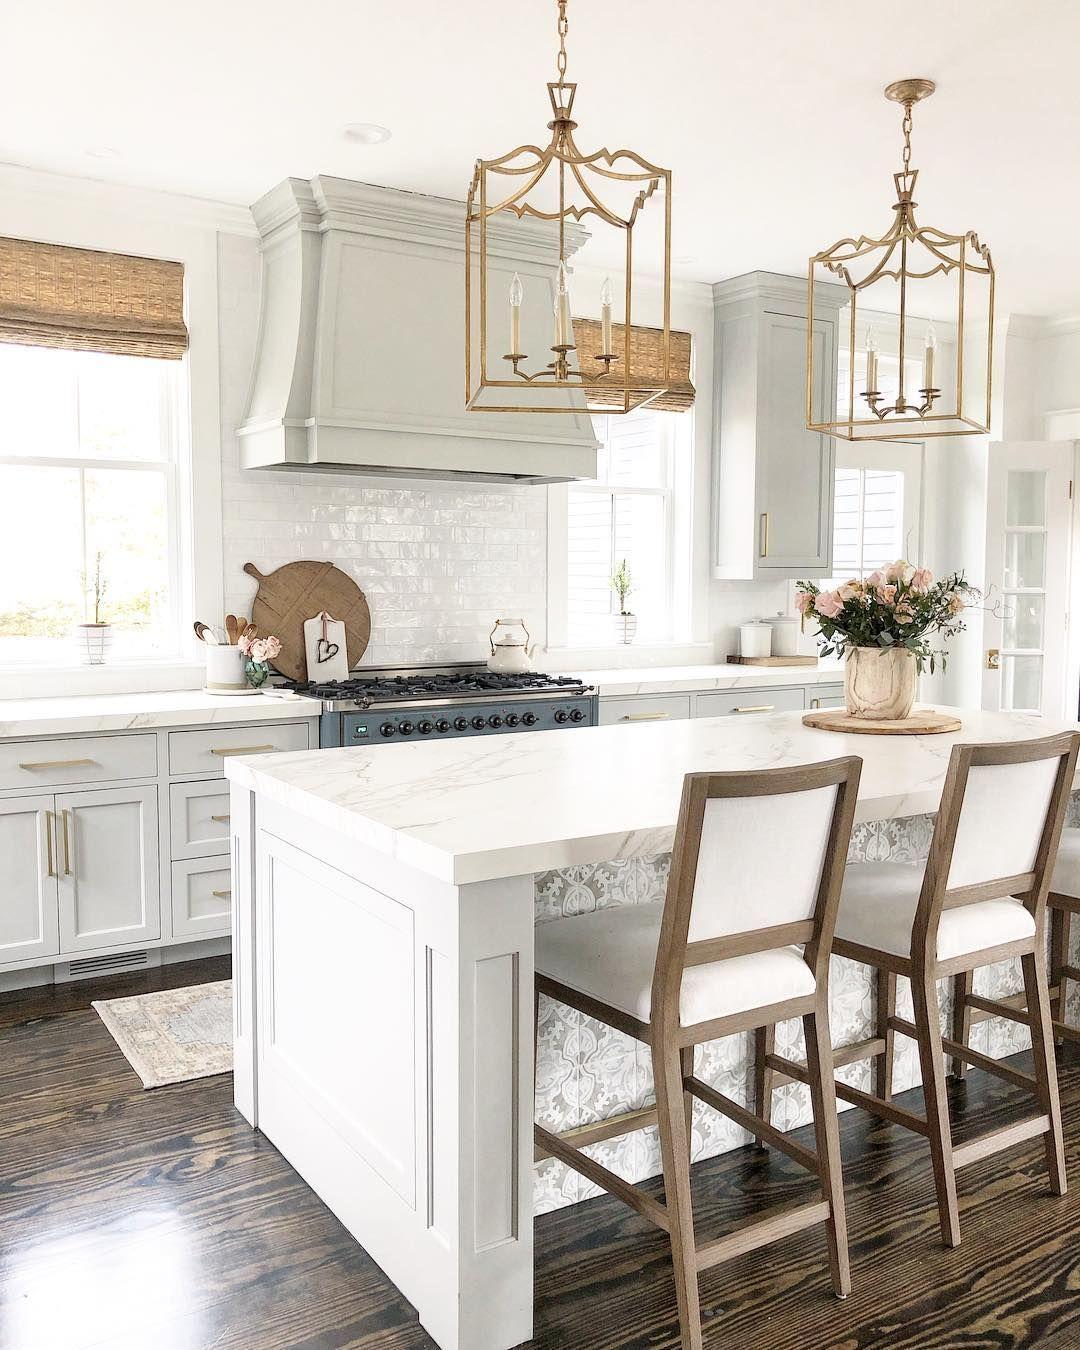 Farmhouse Kitchen Decor Ideas mit Holz-Thekenstühlen via @finding__lovely